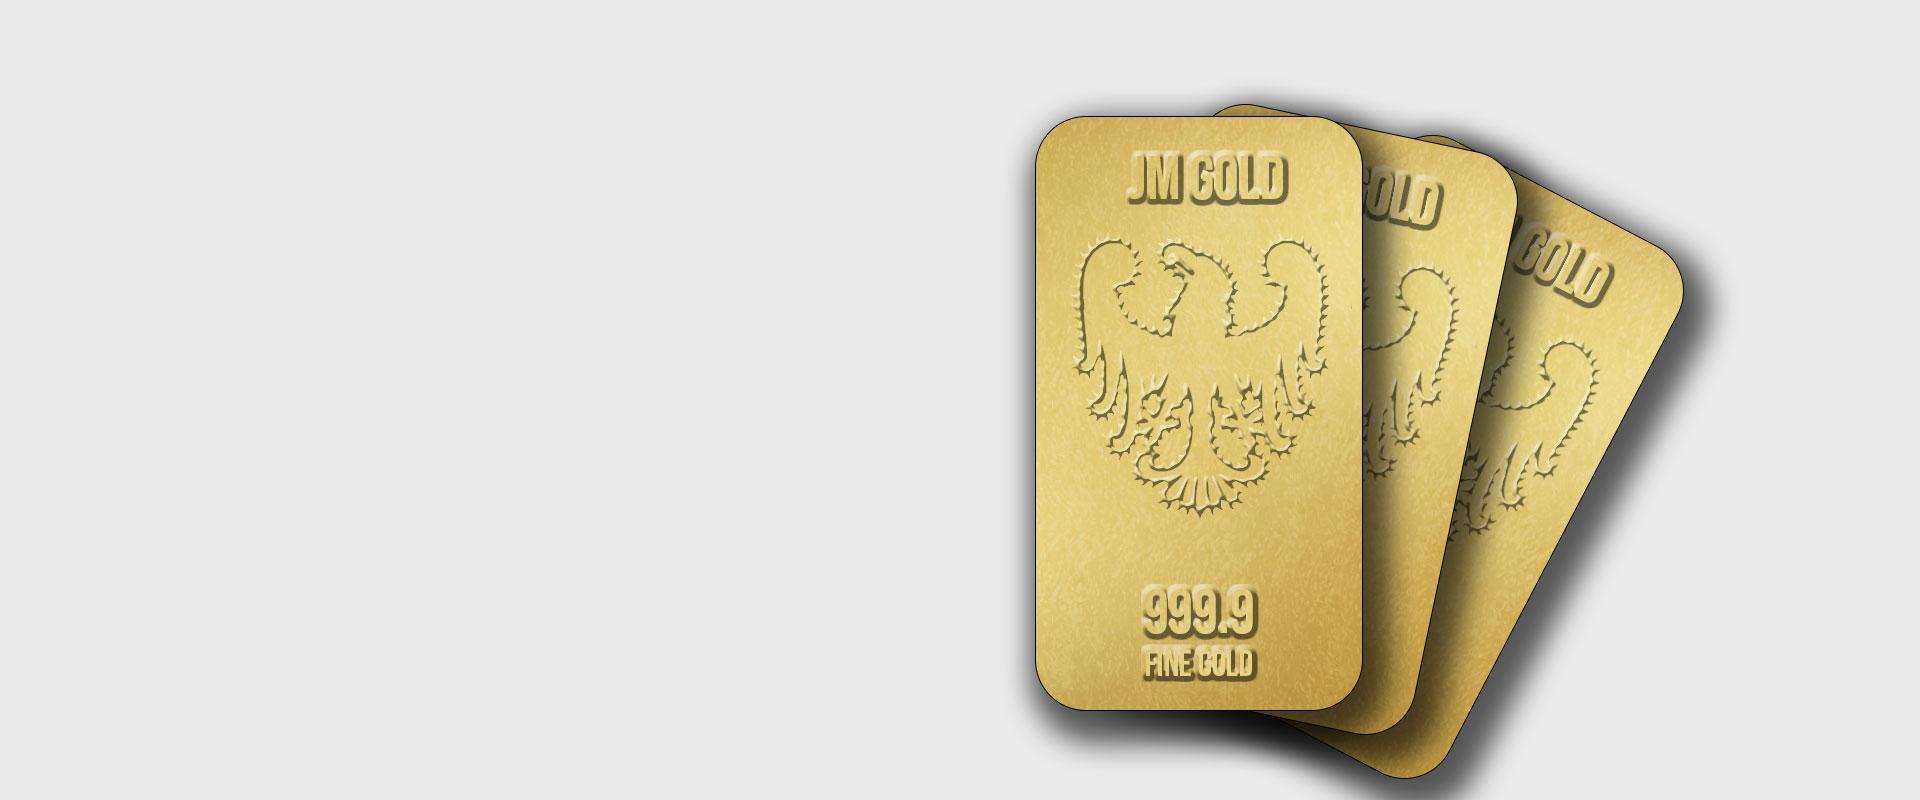 JM Gold - 349.11.72.755